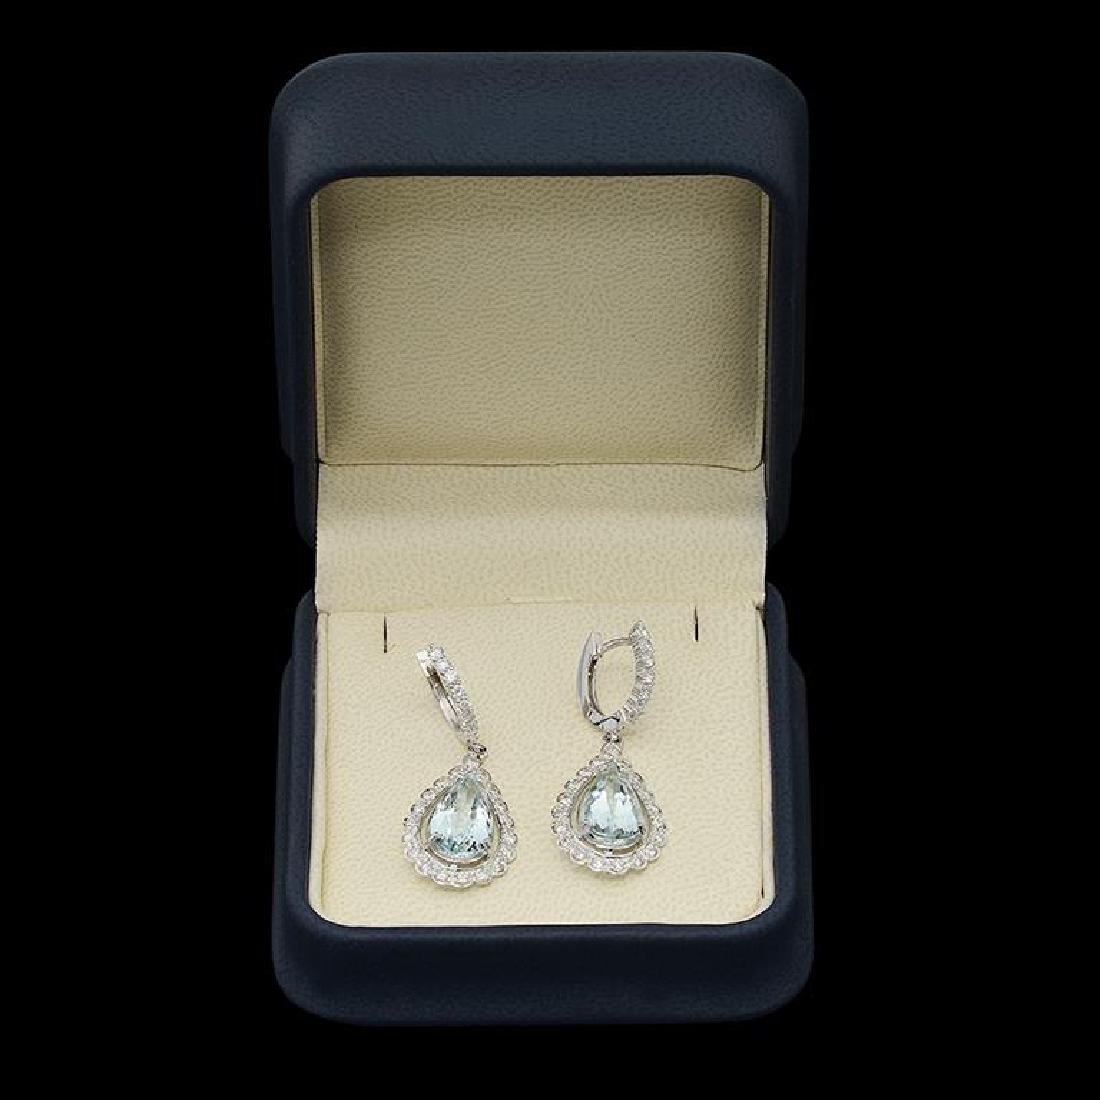 14k Gold 7.68ct Aquamarine 1.65ct Diamond Earrings - 2